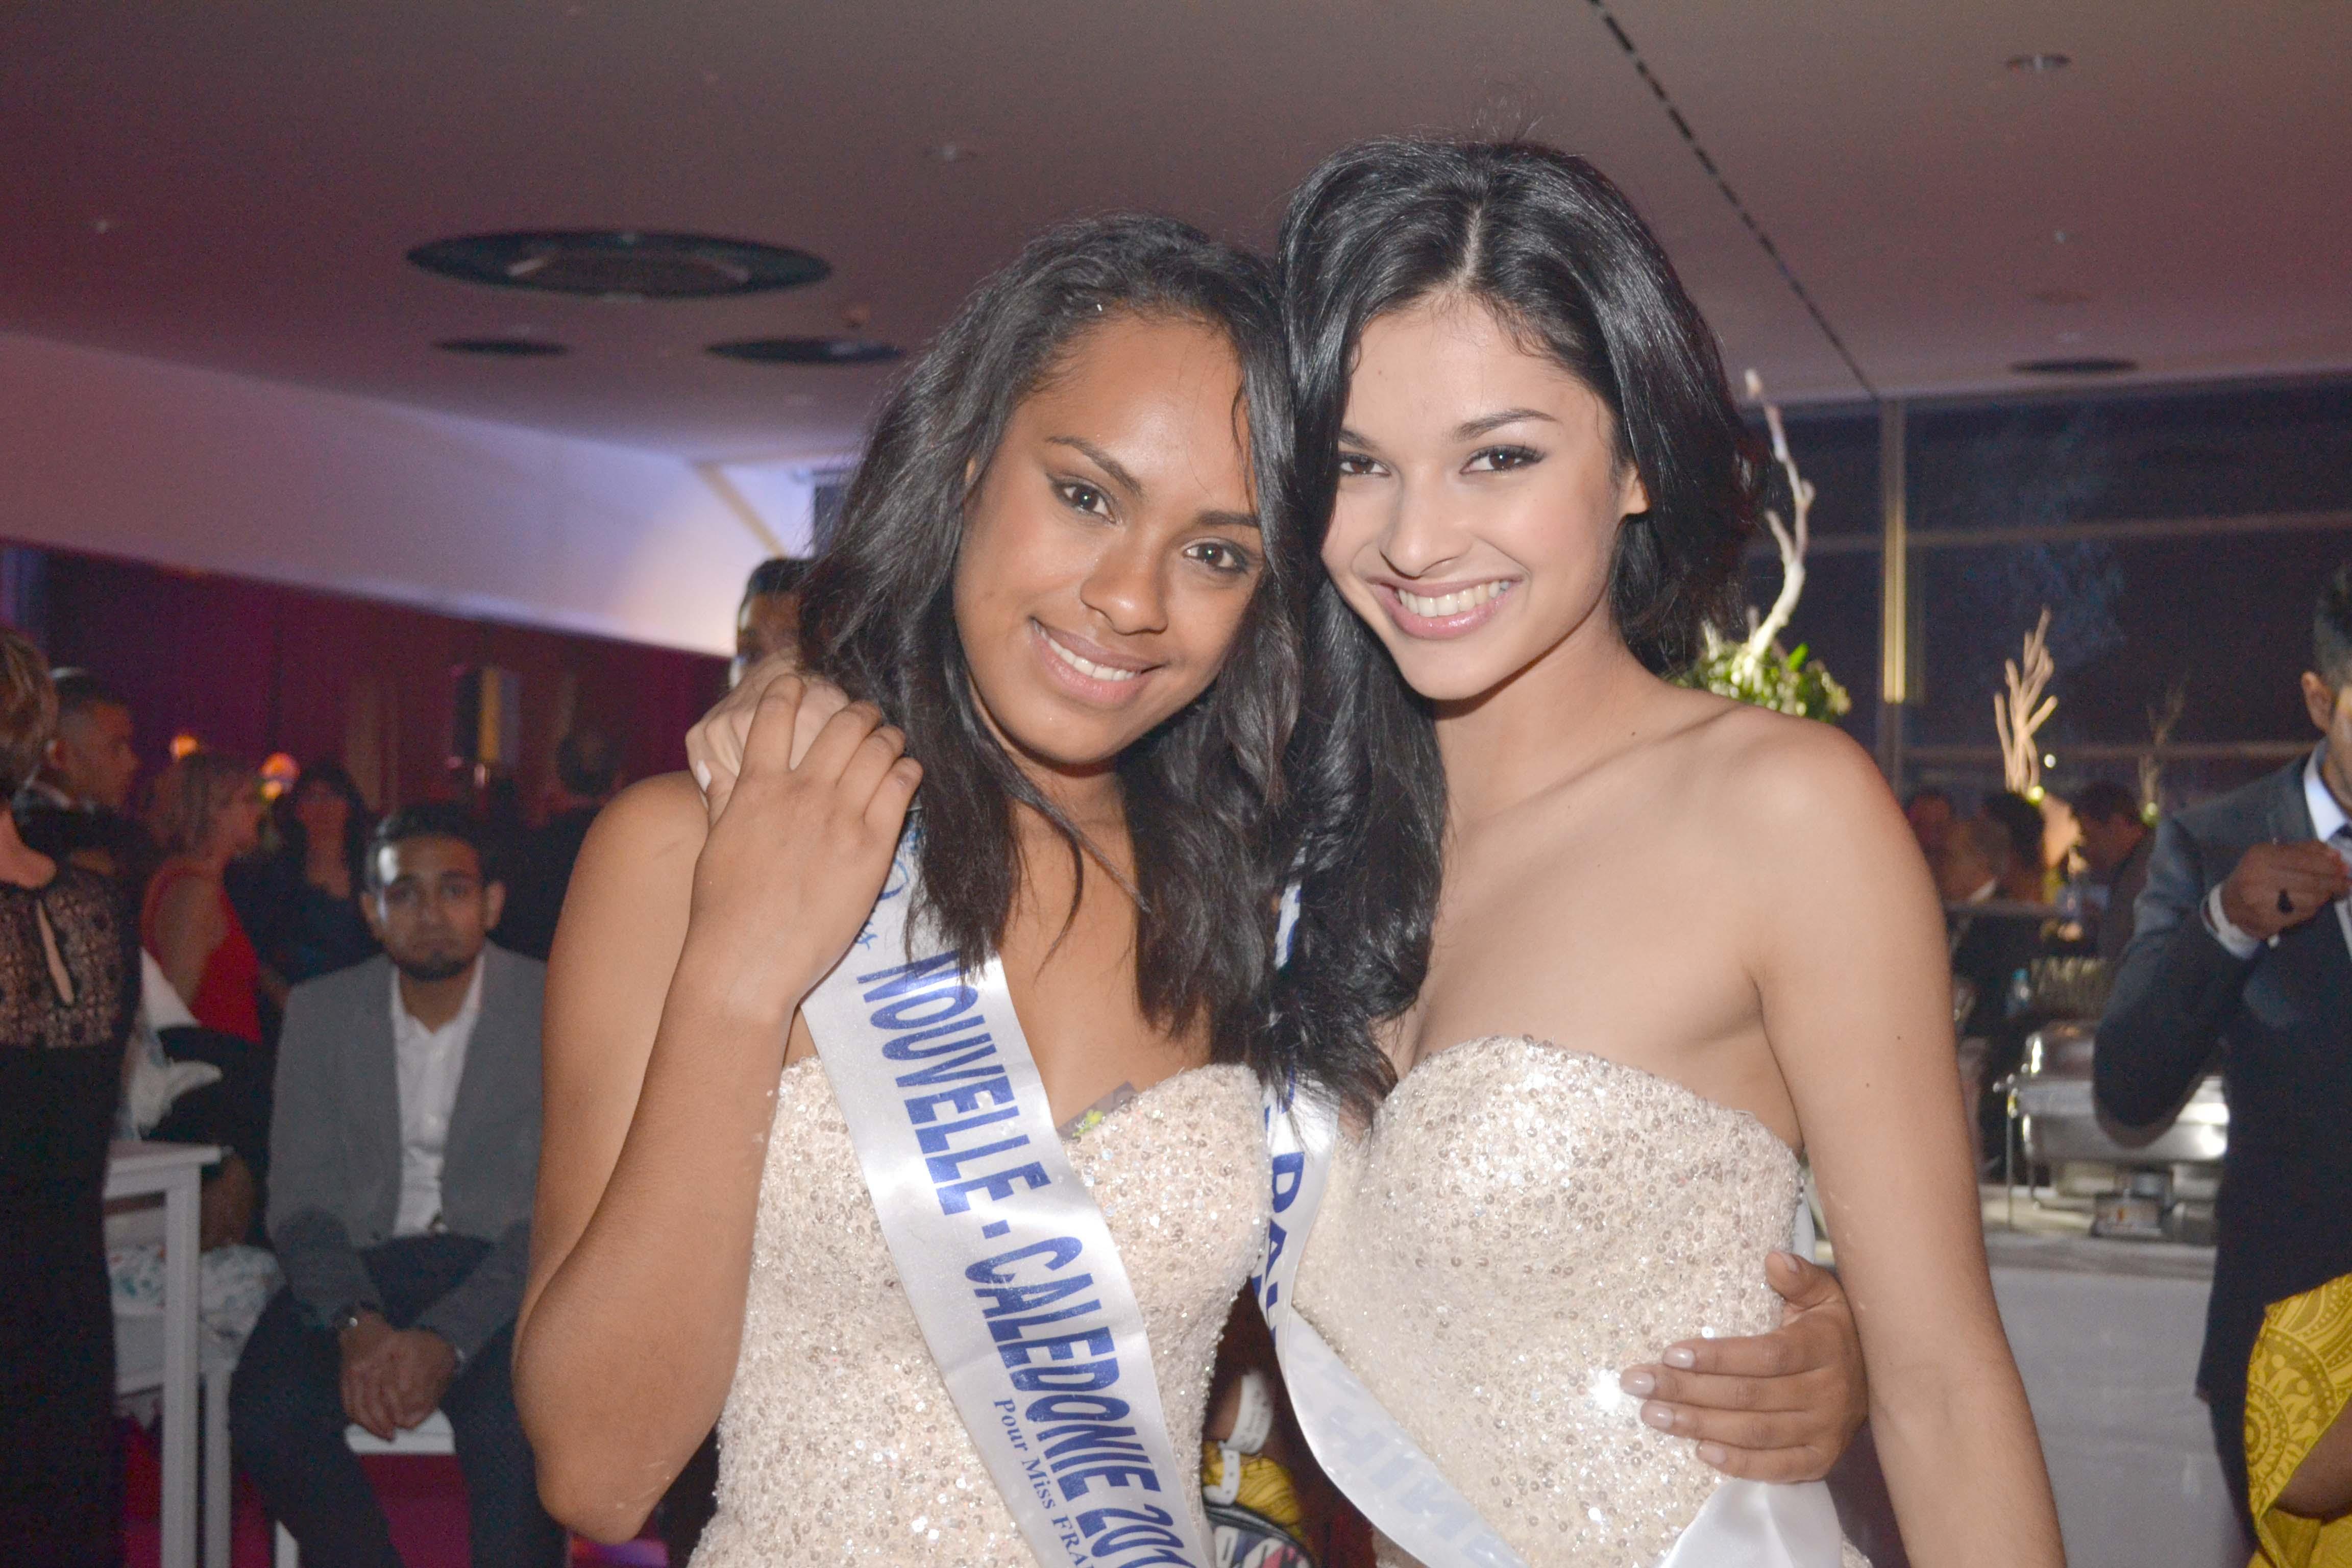 Azuima avec sa meilleure amie Miss Nouvelle Calédonie, Gyna Moereo